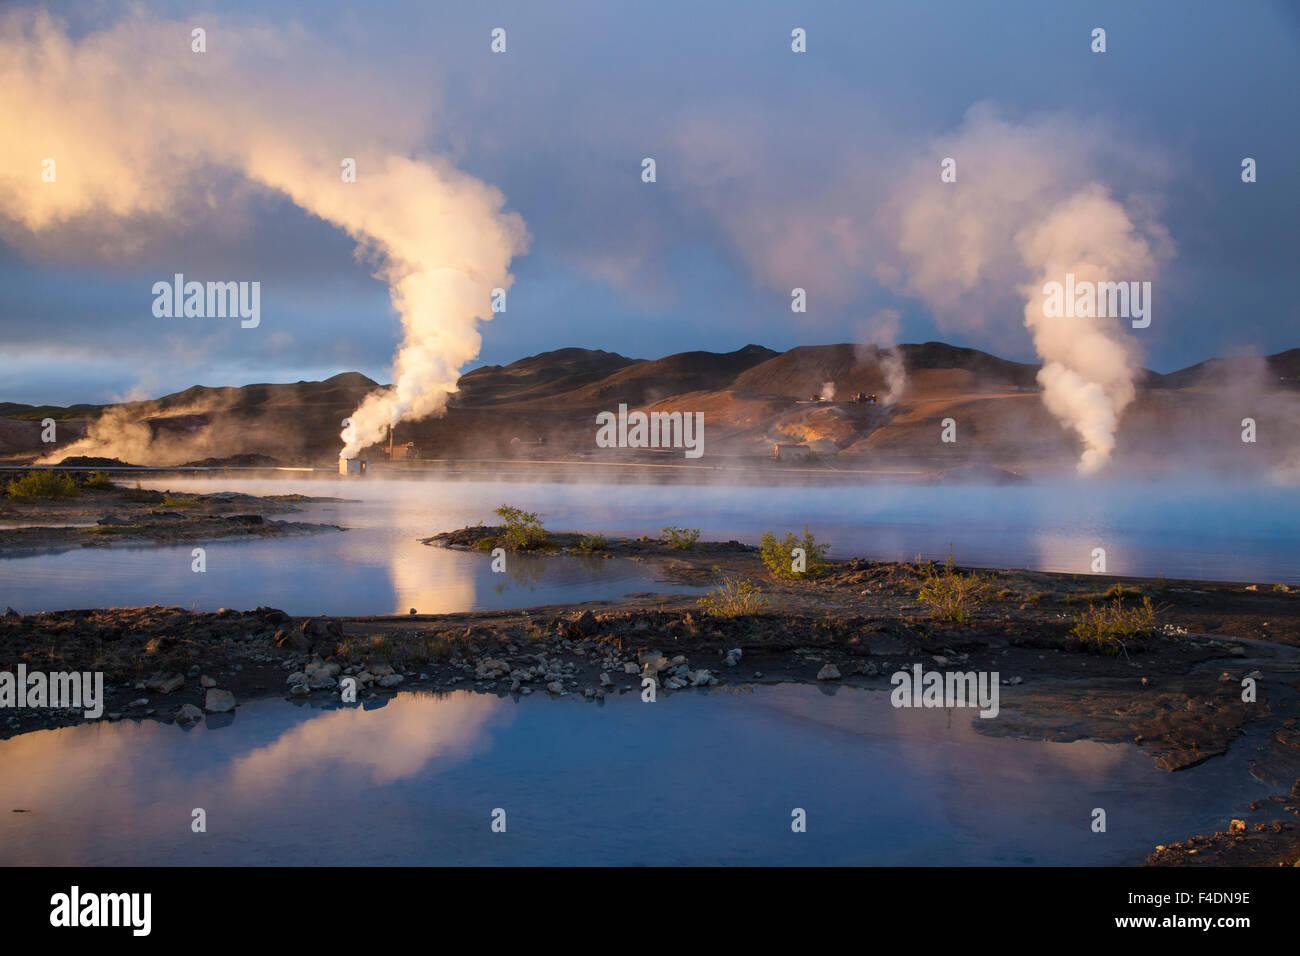 Sunset light over Bjarnarflag geothermal power station, Myvatn, Nordhurland Eystra, Iceland. - Stock Image